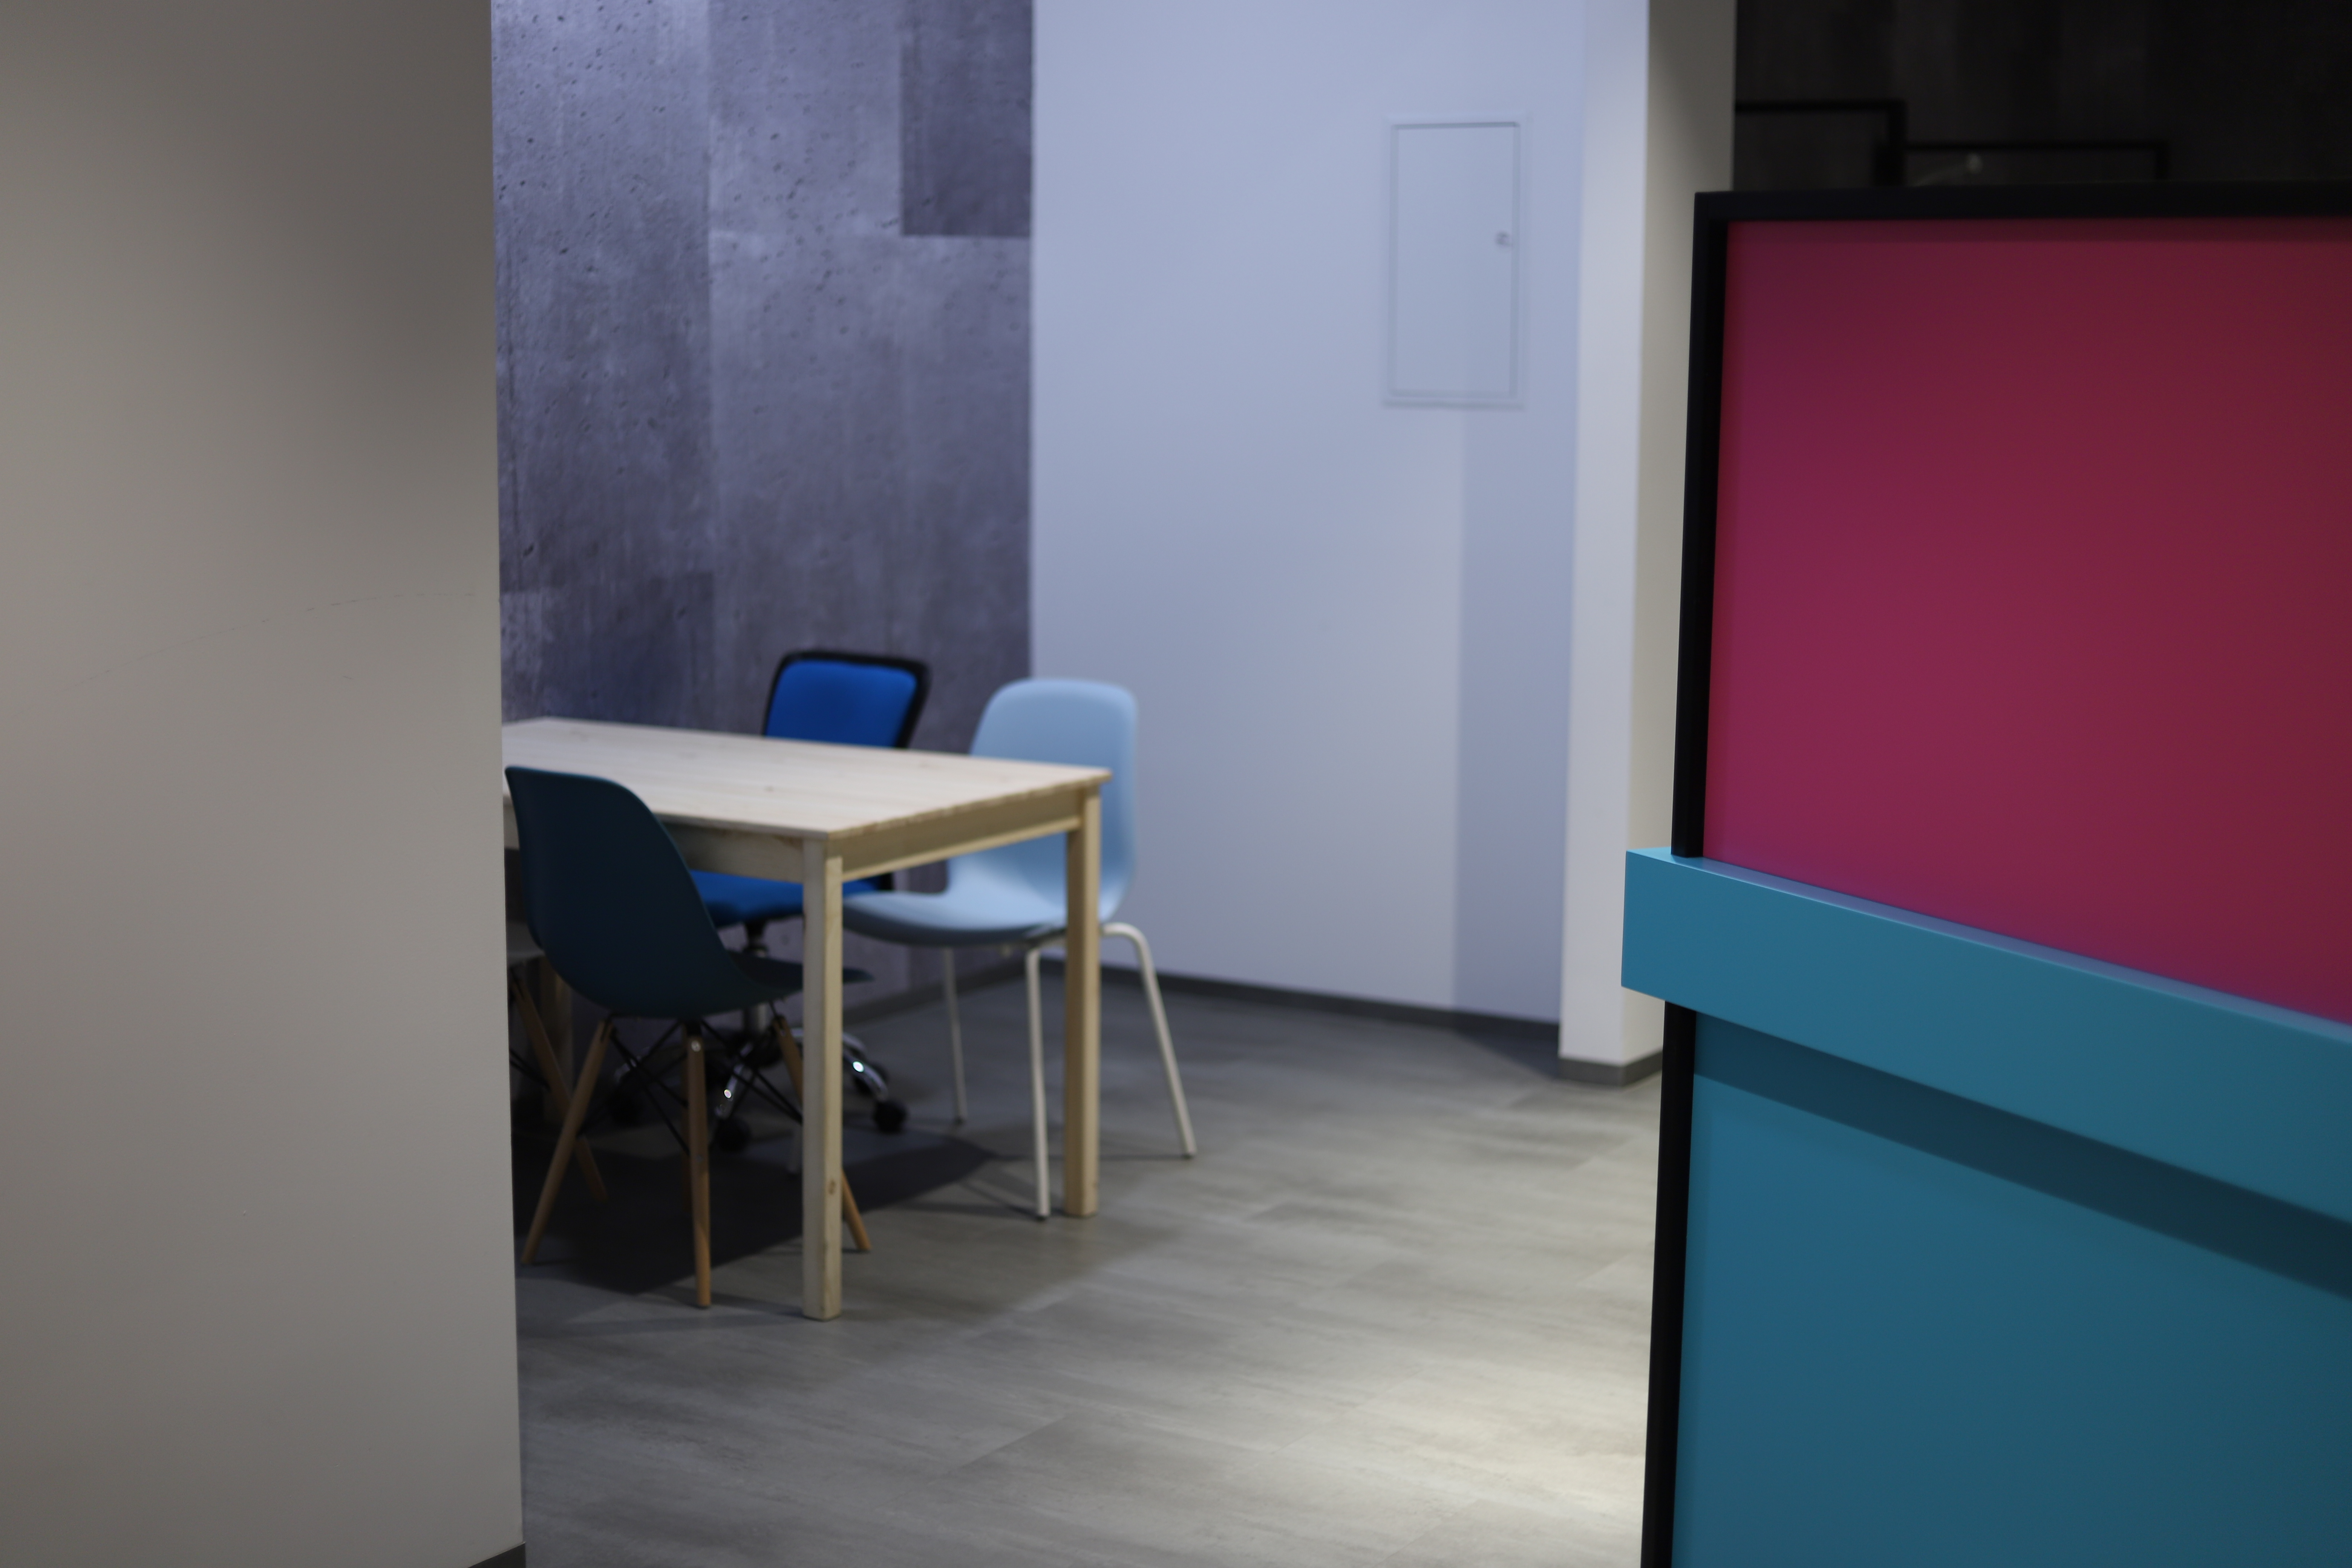 odwied coworking space przy fitness platinium bratys awska fitness platinium. Black Bedroom Furniture Sets. Home Design Ideas